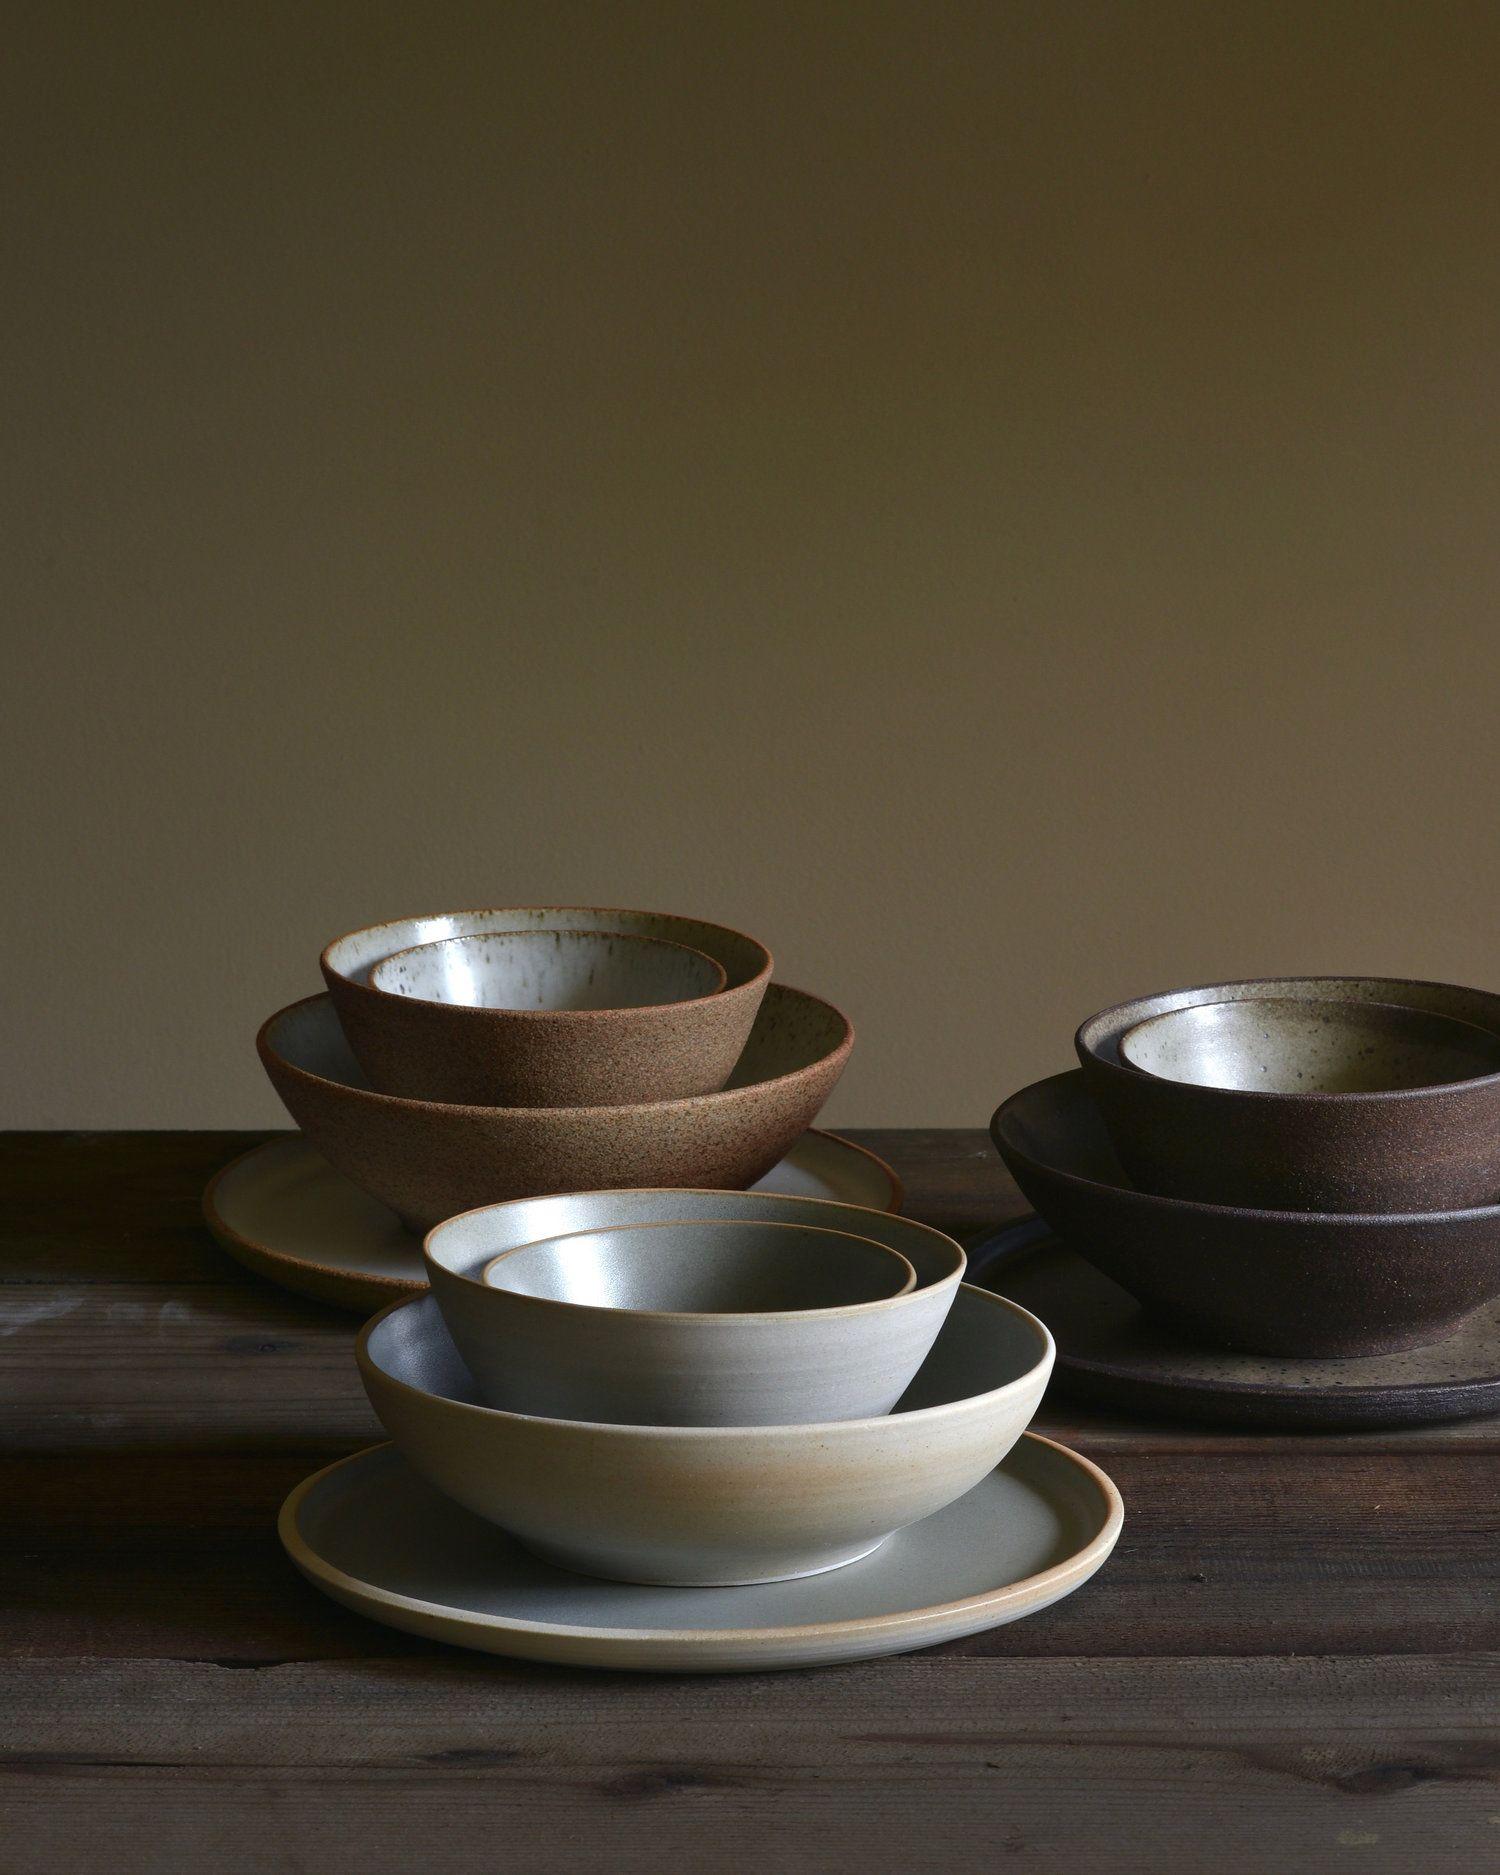 Gallery Bob Dinetz Wheel Thrown Pottery Pottery Wheel Thrown Ceramics Wheel Thrown Pottery